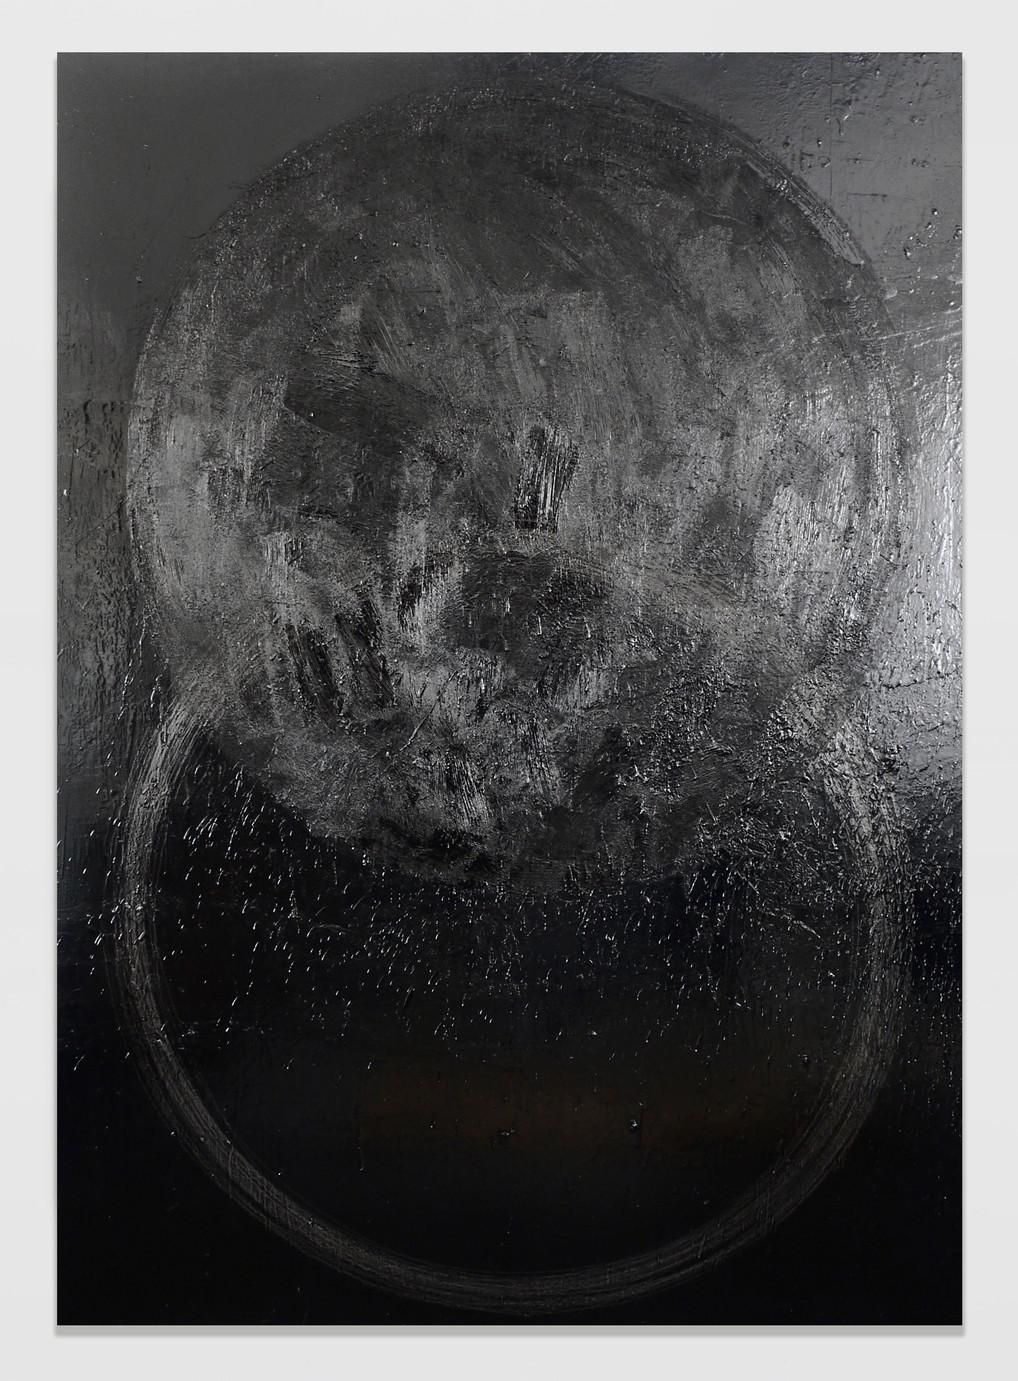 sem título 2016 esmalte, piche e grafite sobre madeira 220x160cm